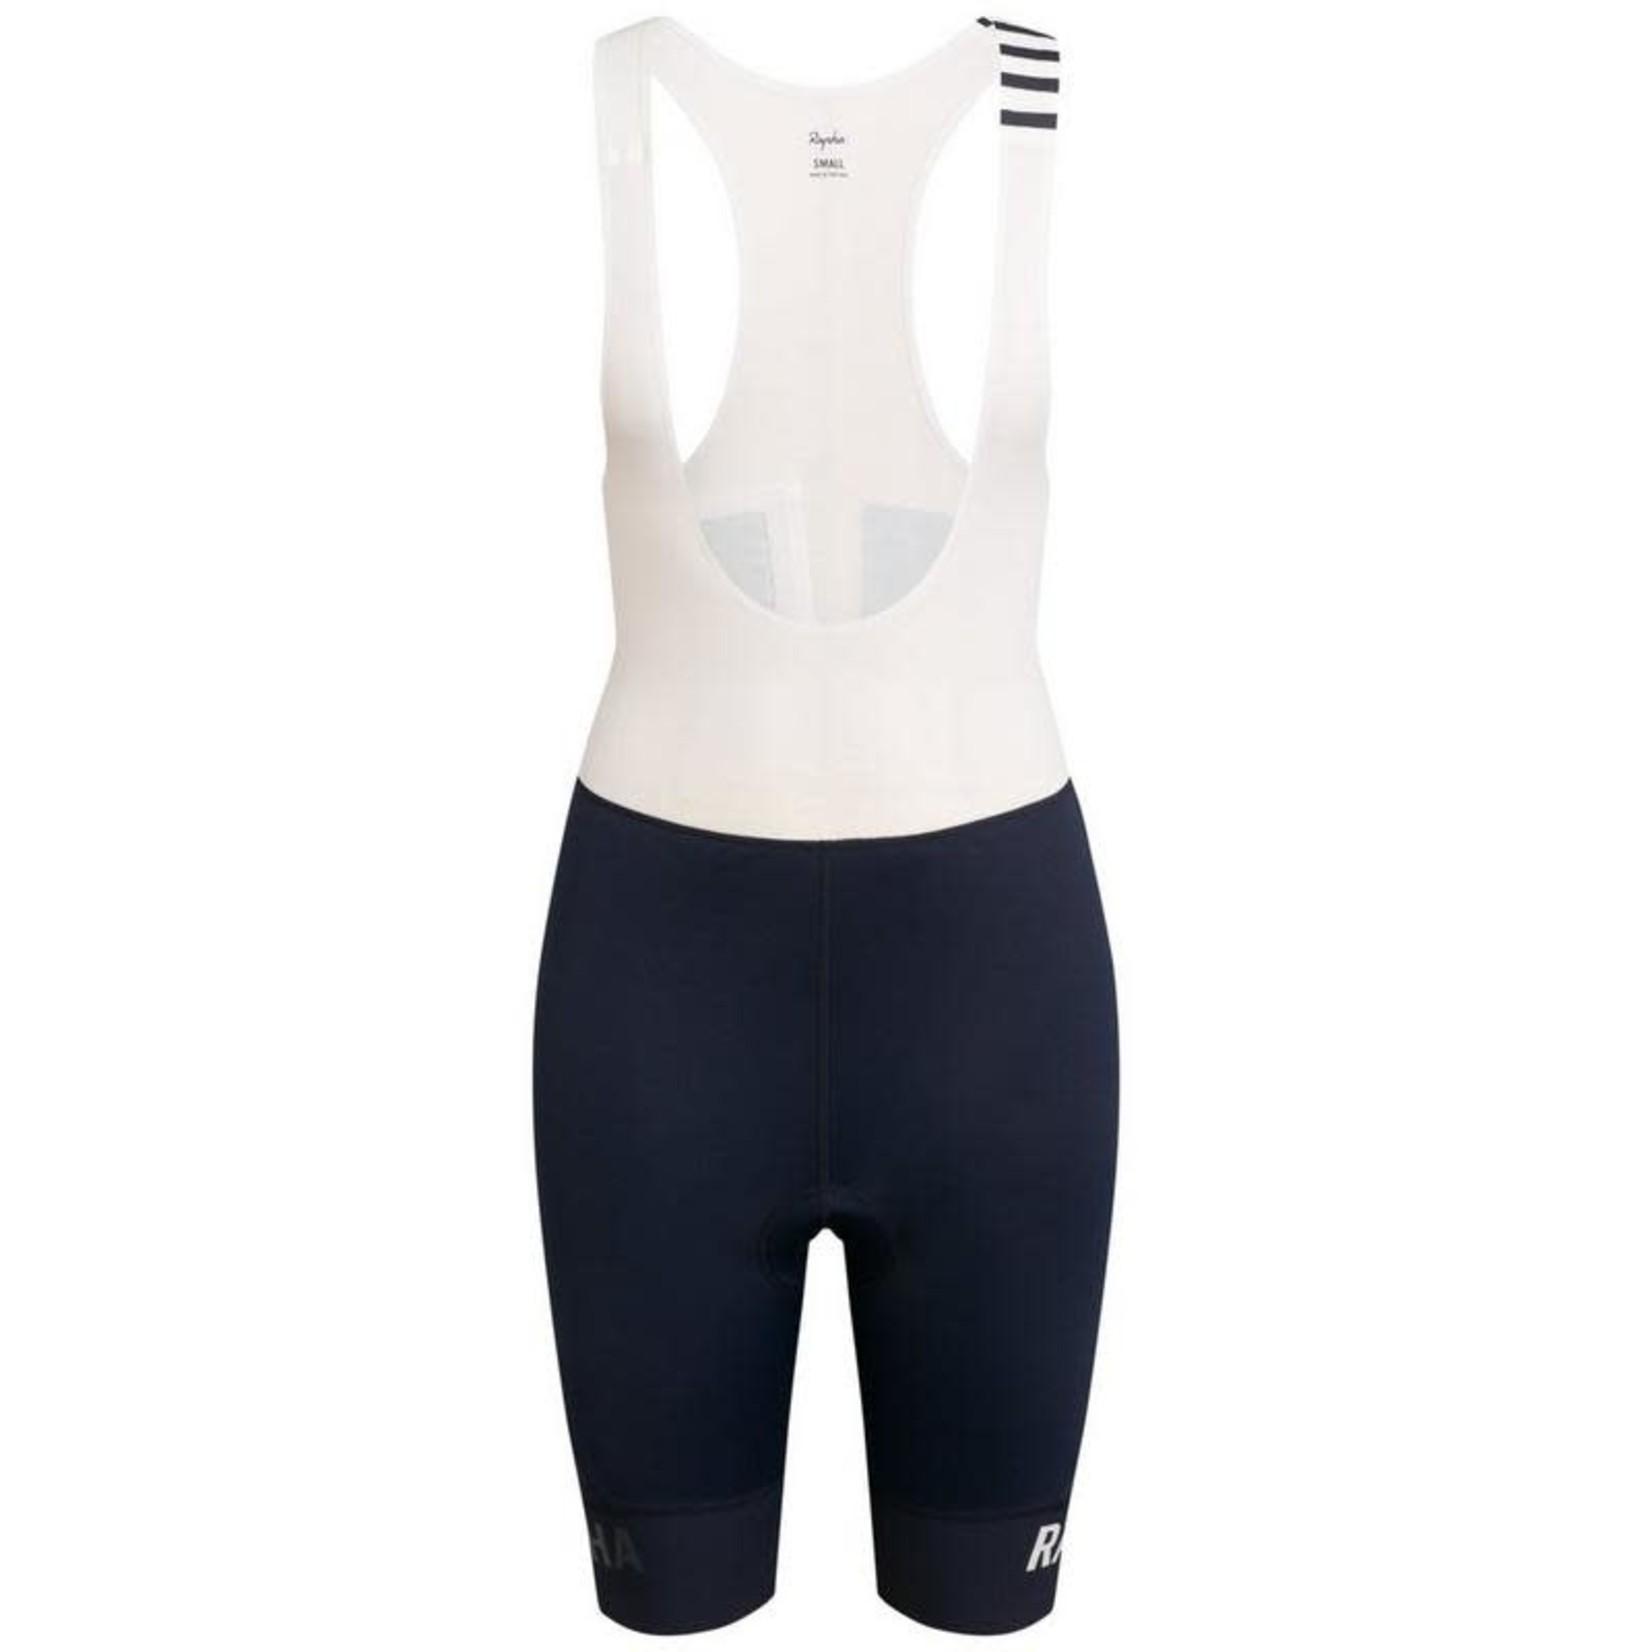 Rapha Rapha Women's Pro Team Bib Shorts - Regular